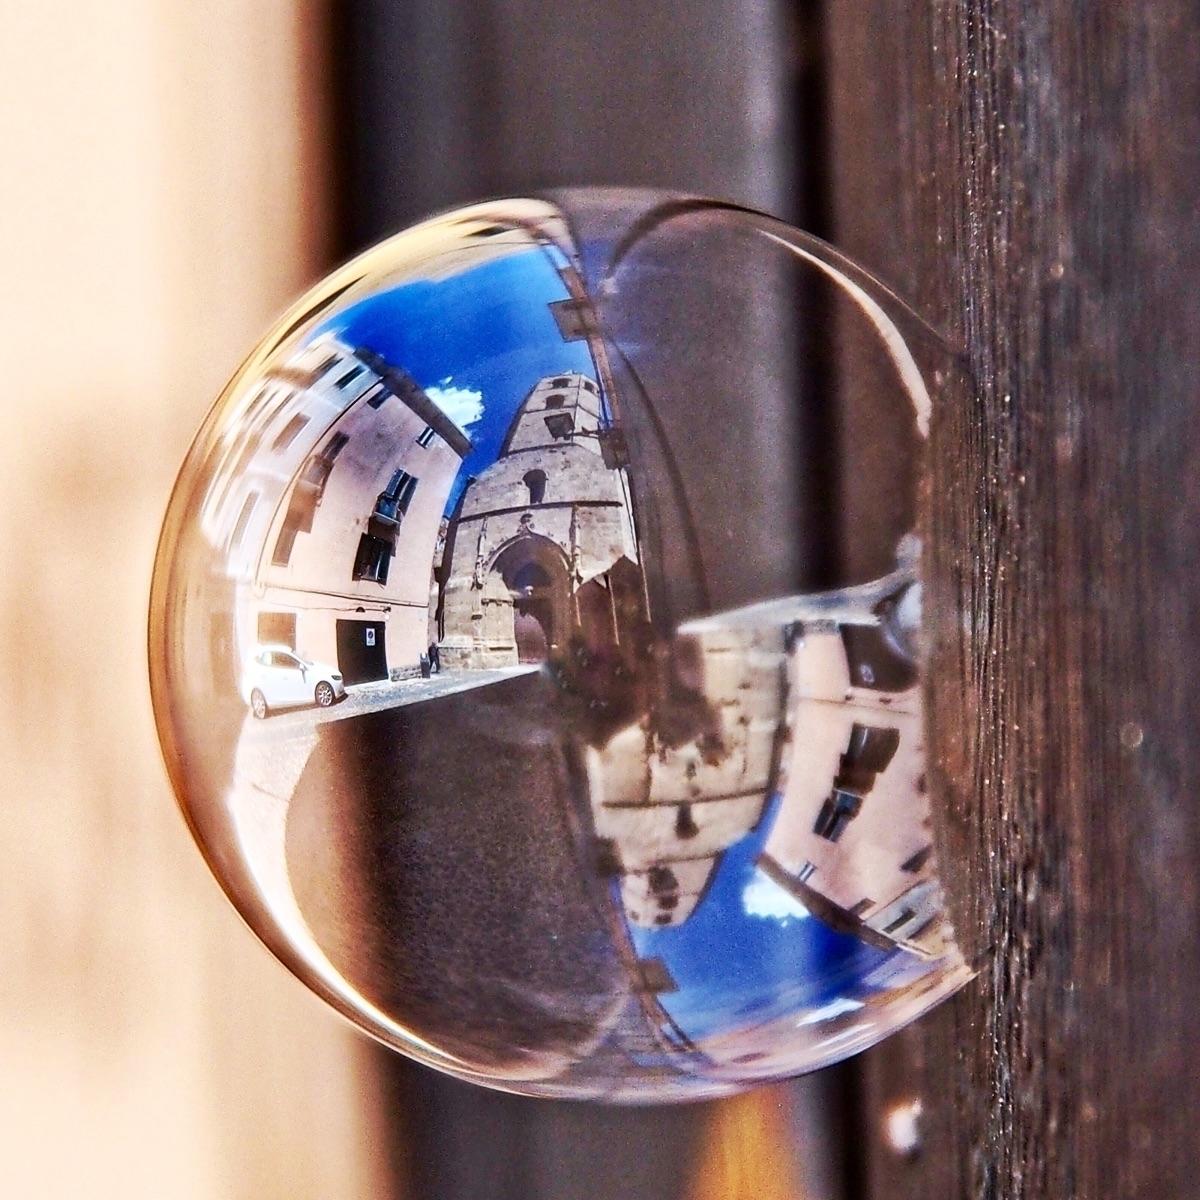 Iridescent bubbles, transparent - kyphotos   ello